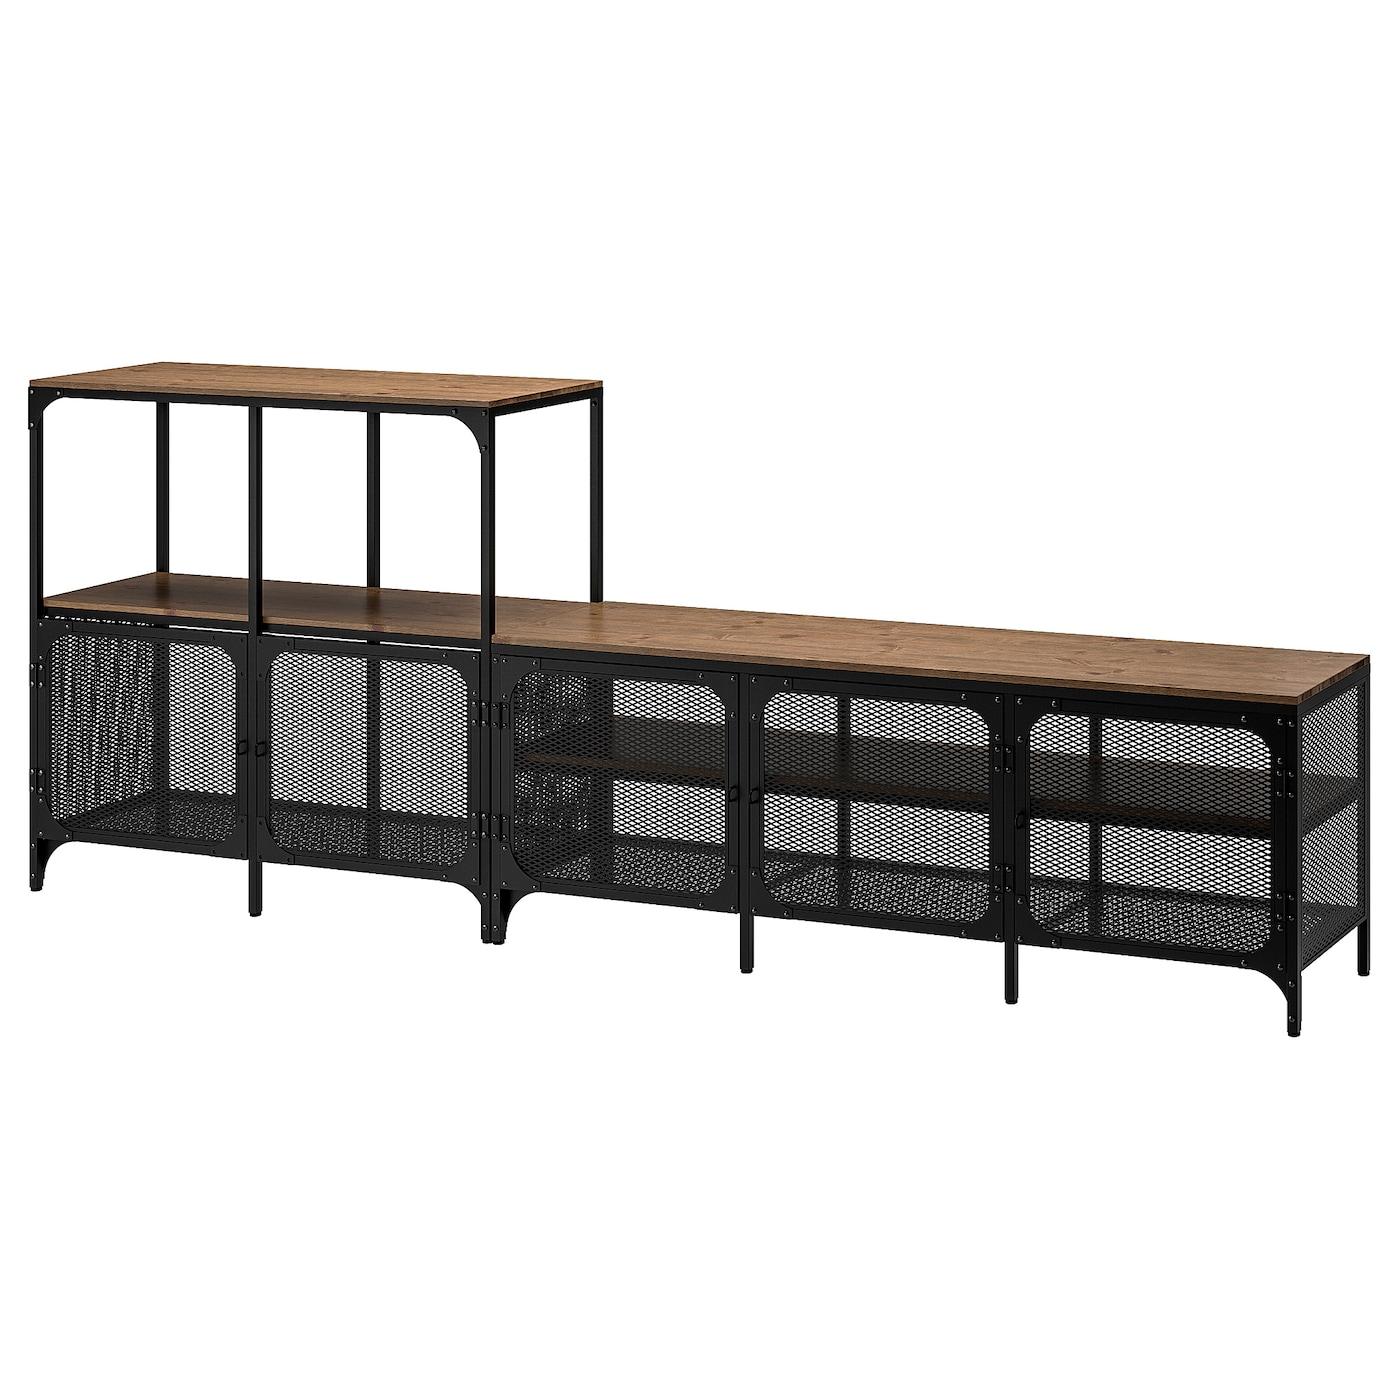 Meubles TV | Design scandinave & Pas cher - IKEA